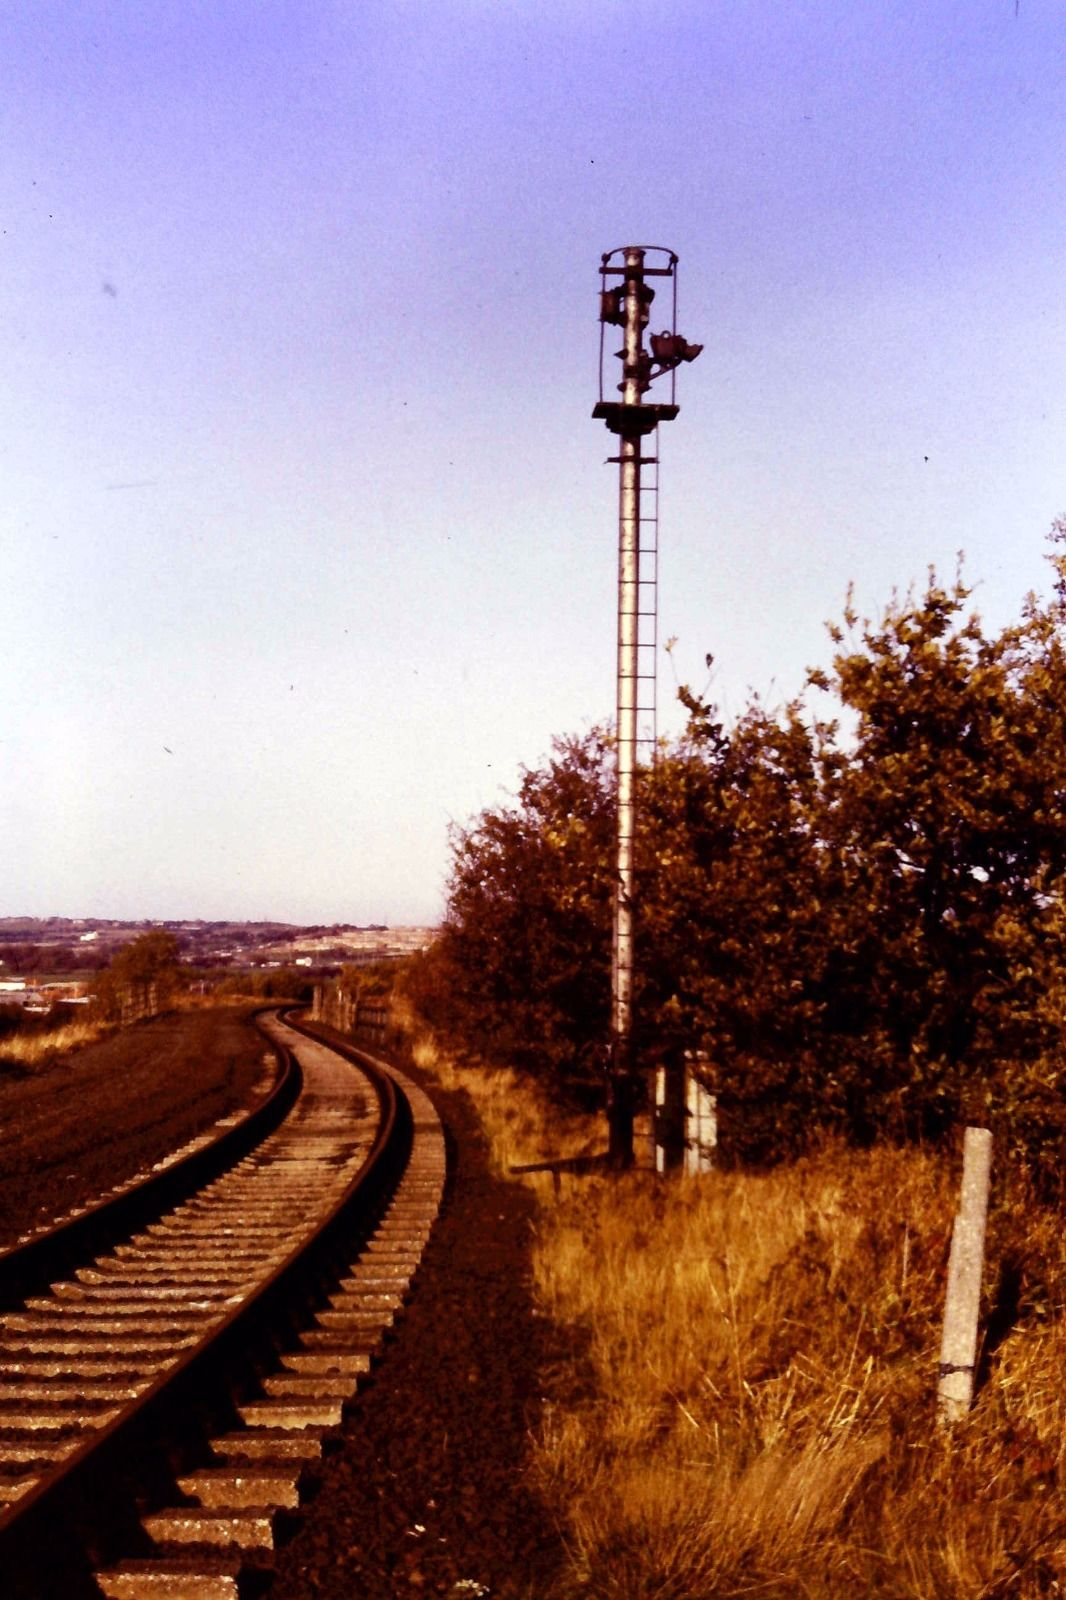 Signal post at Washington in October 1983. Photo copyright Colin Alexander